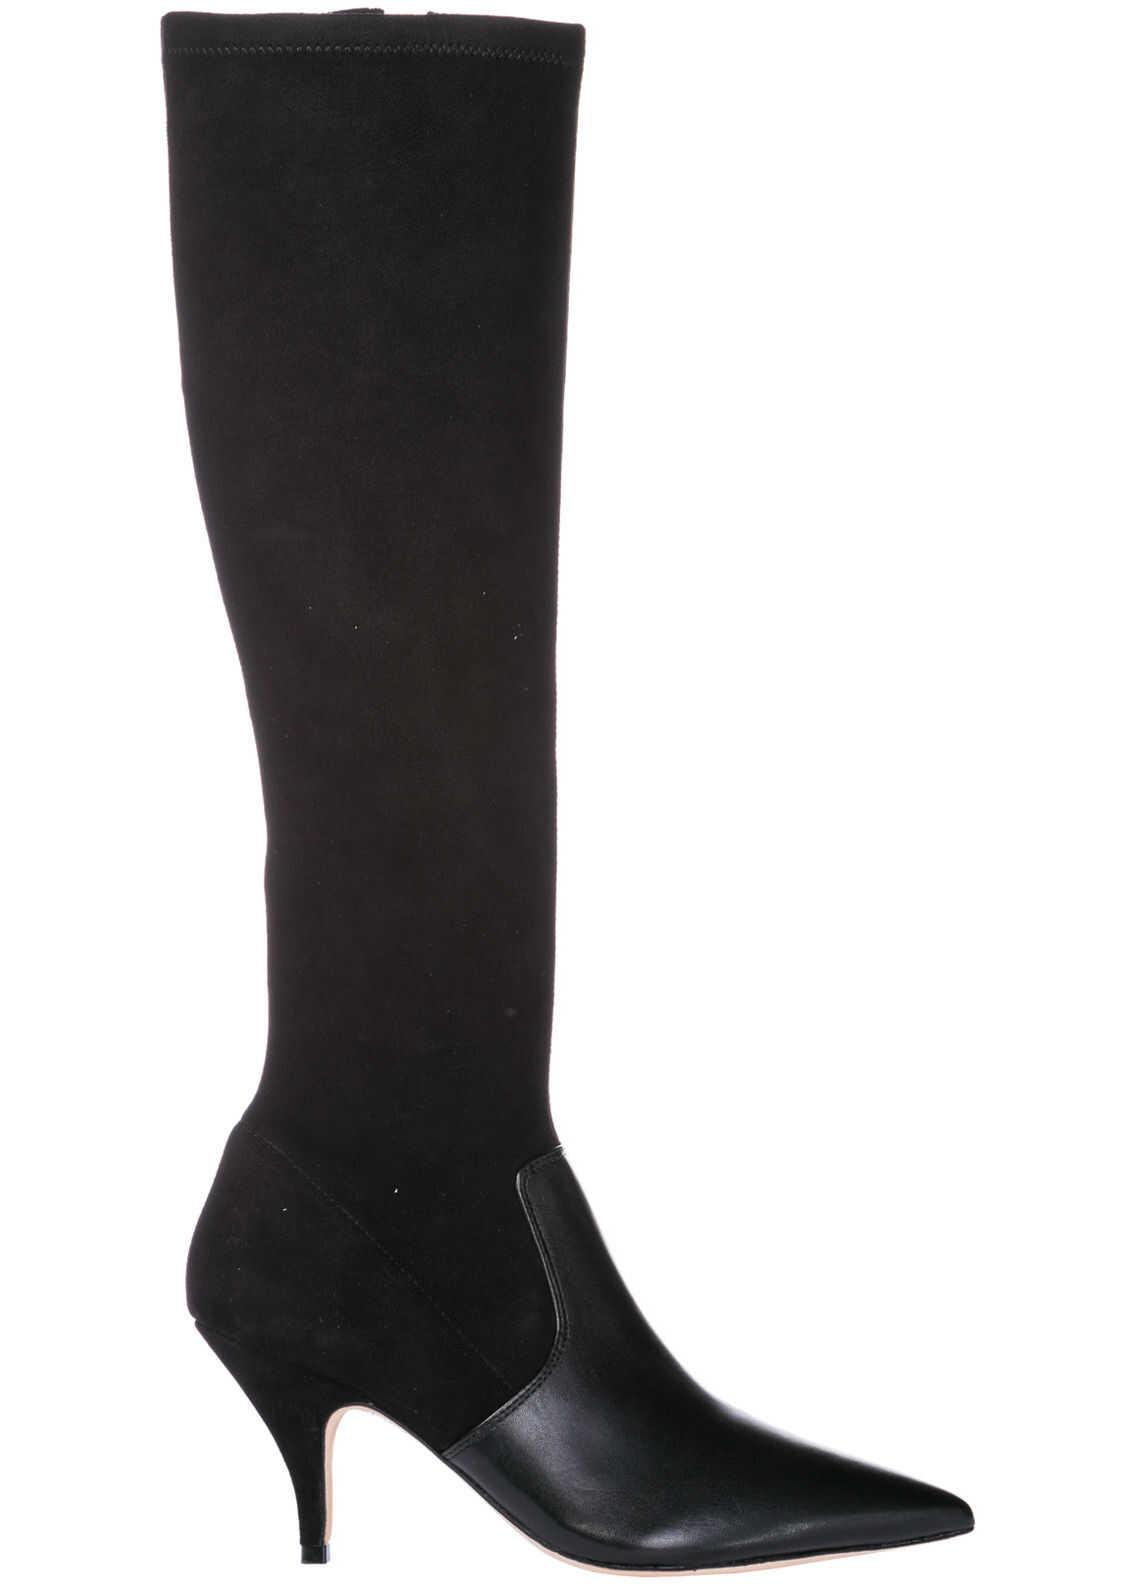 Tory Burch Boots Georgina Black